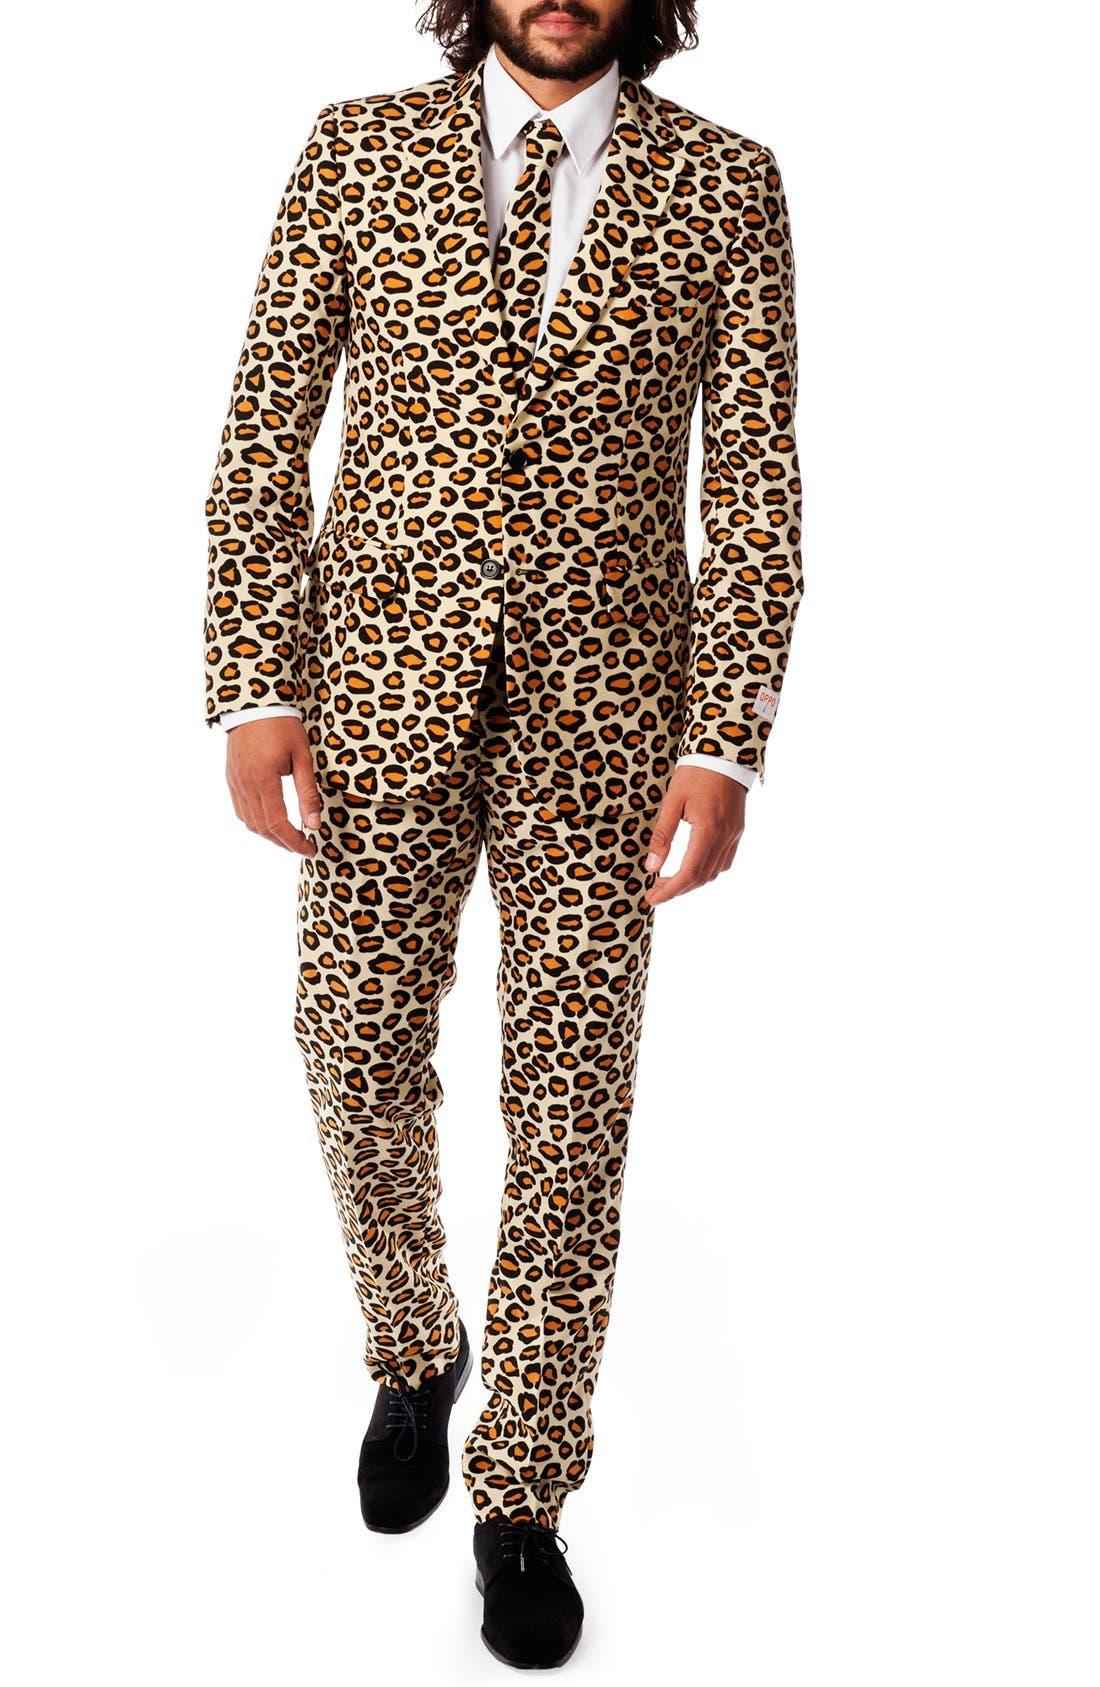 'The Jag' Trim Fit Two-Piece Suit with Tie,                         Main,                         color, 251